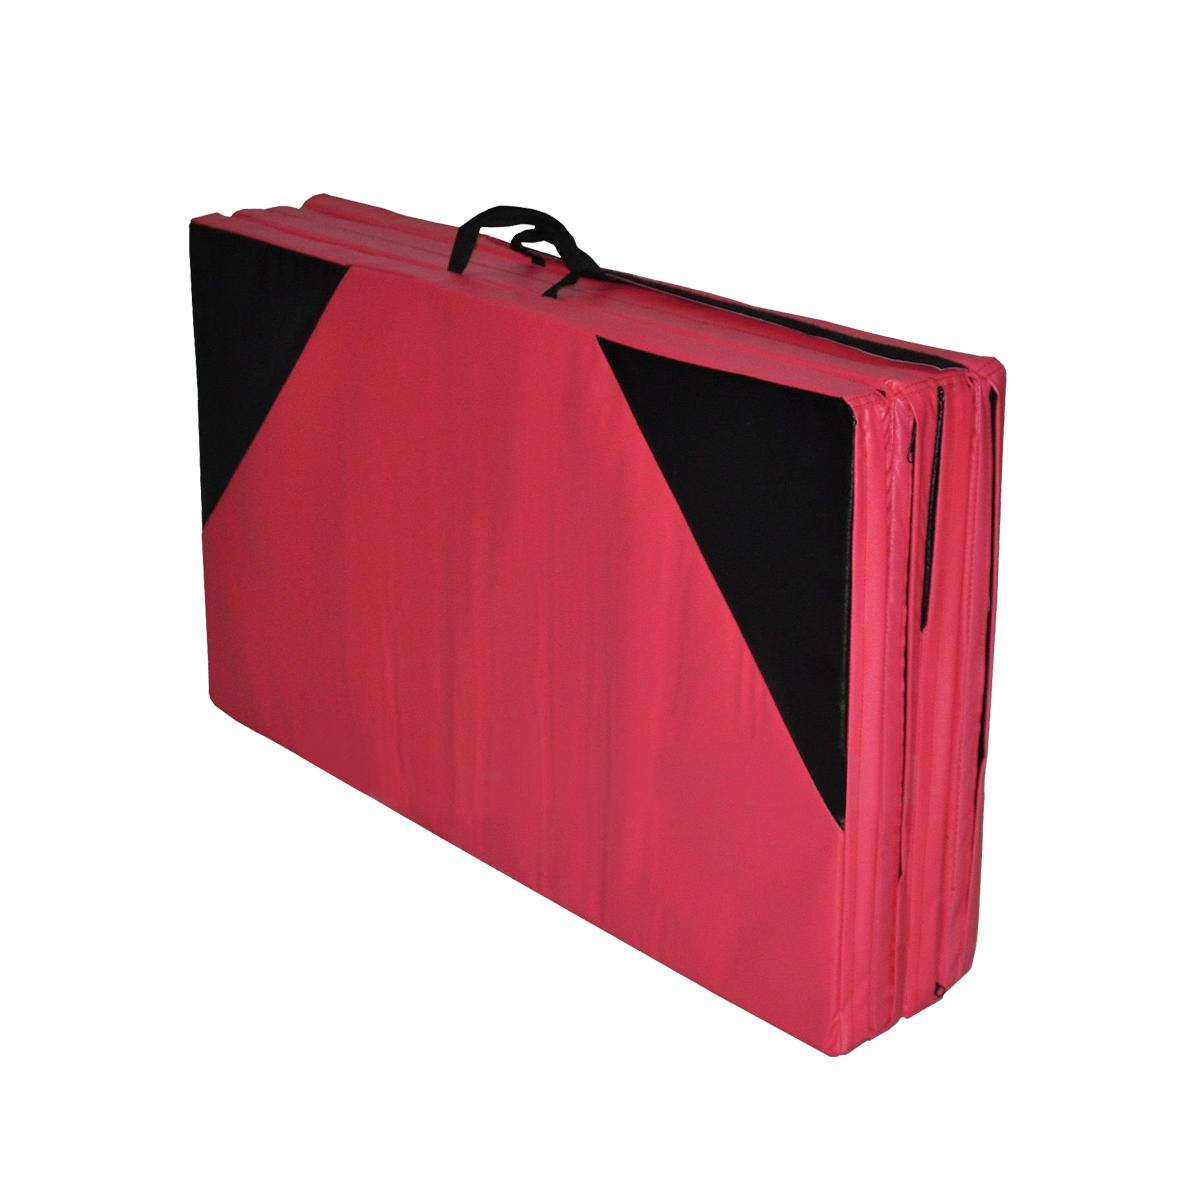 118x47x1.97inch Gymnastics Mat Gym Folding Panel Yoga Exercise Tumbling Fitness Pad